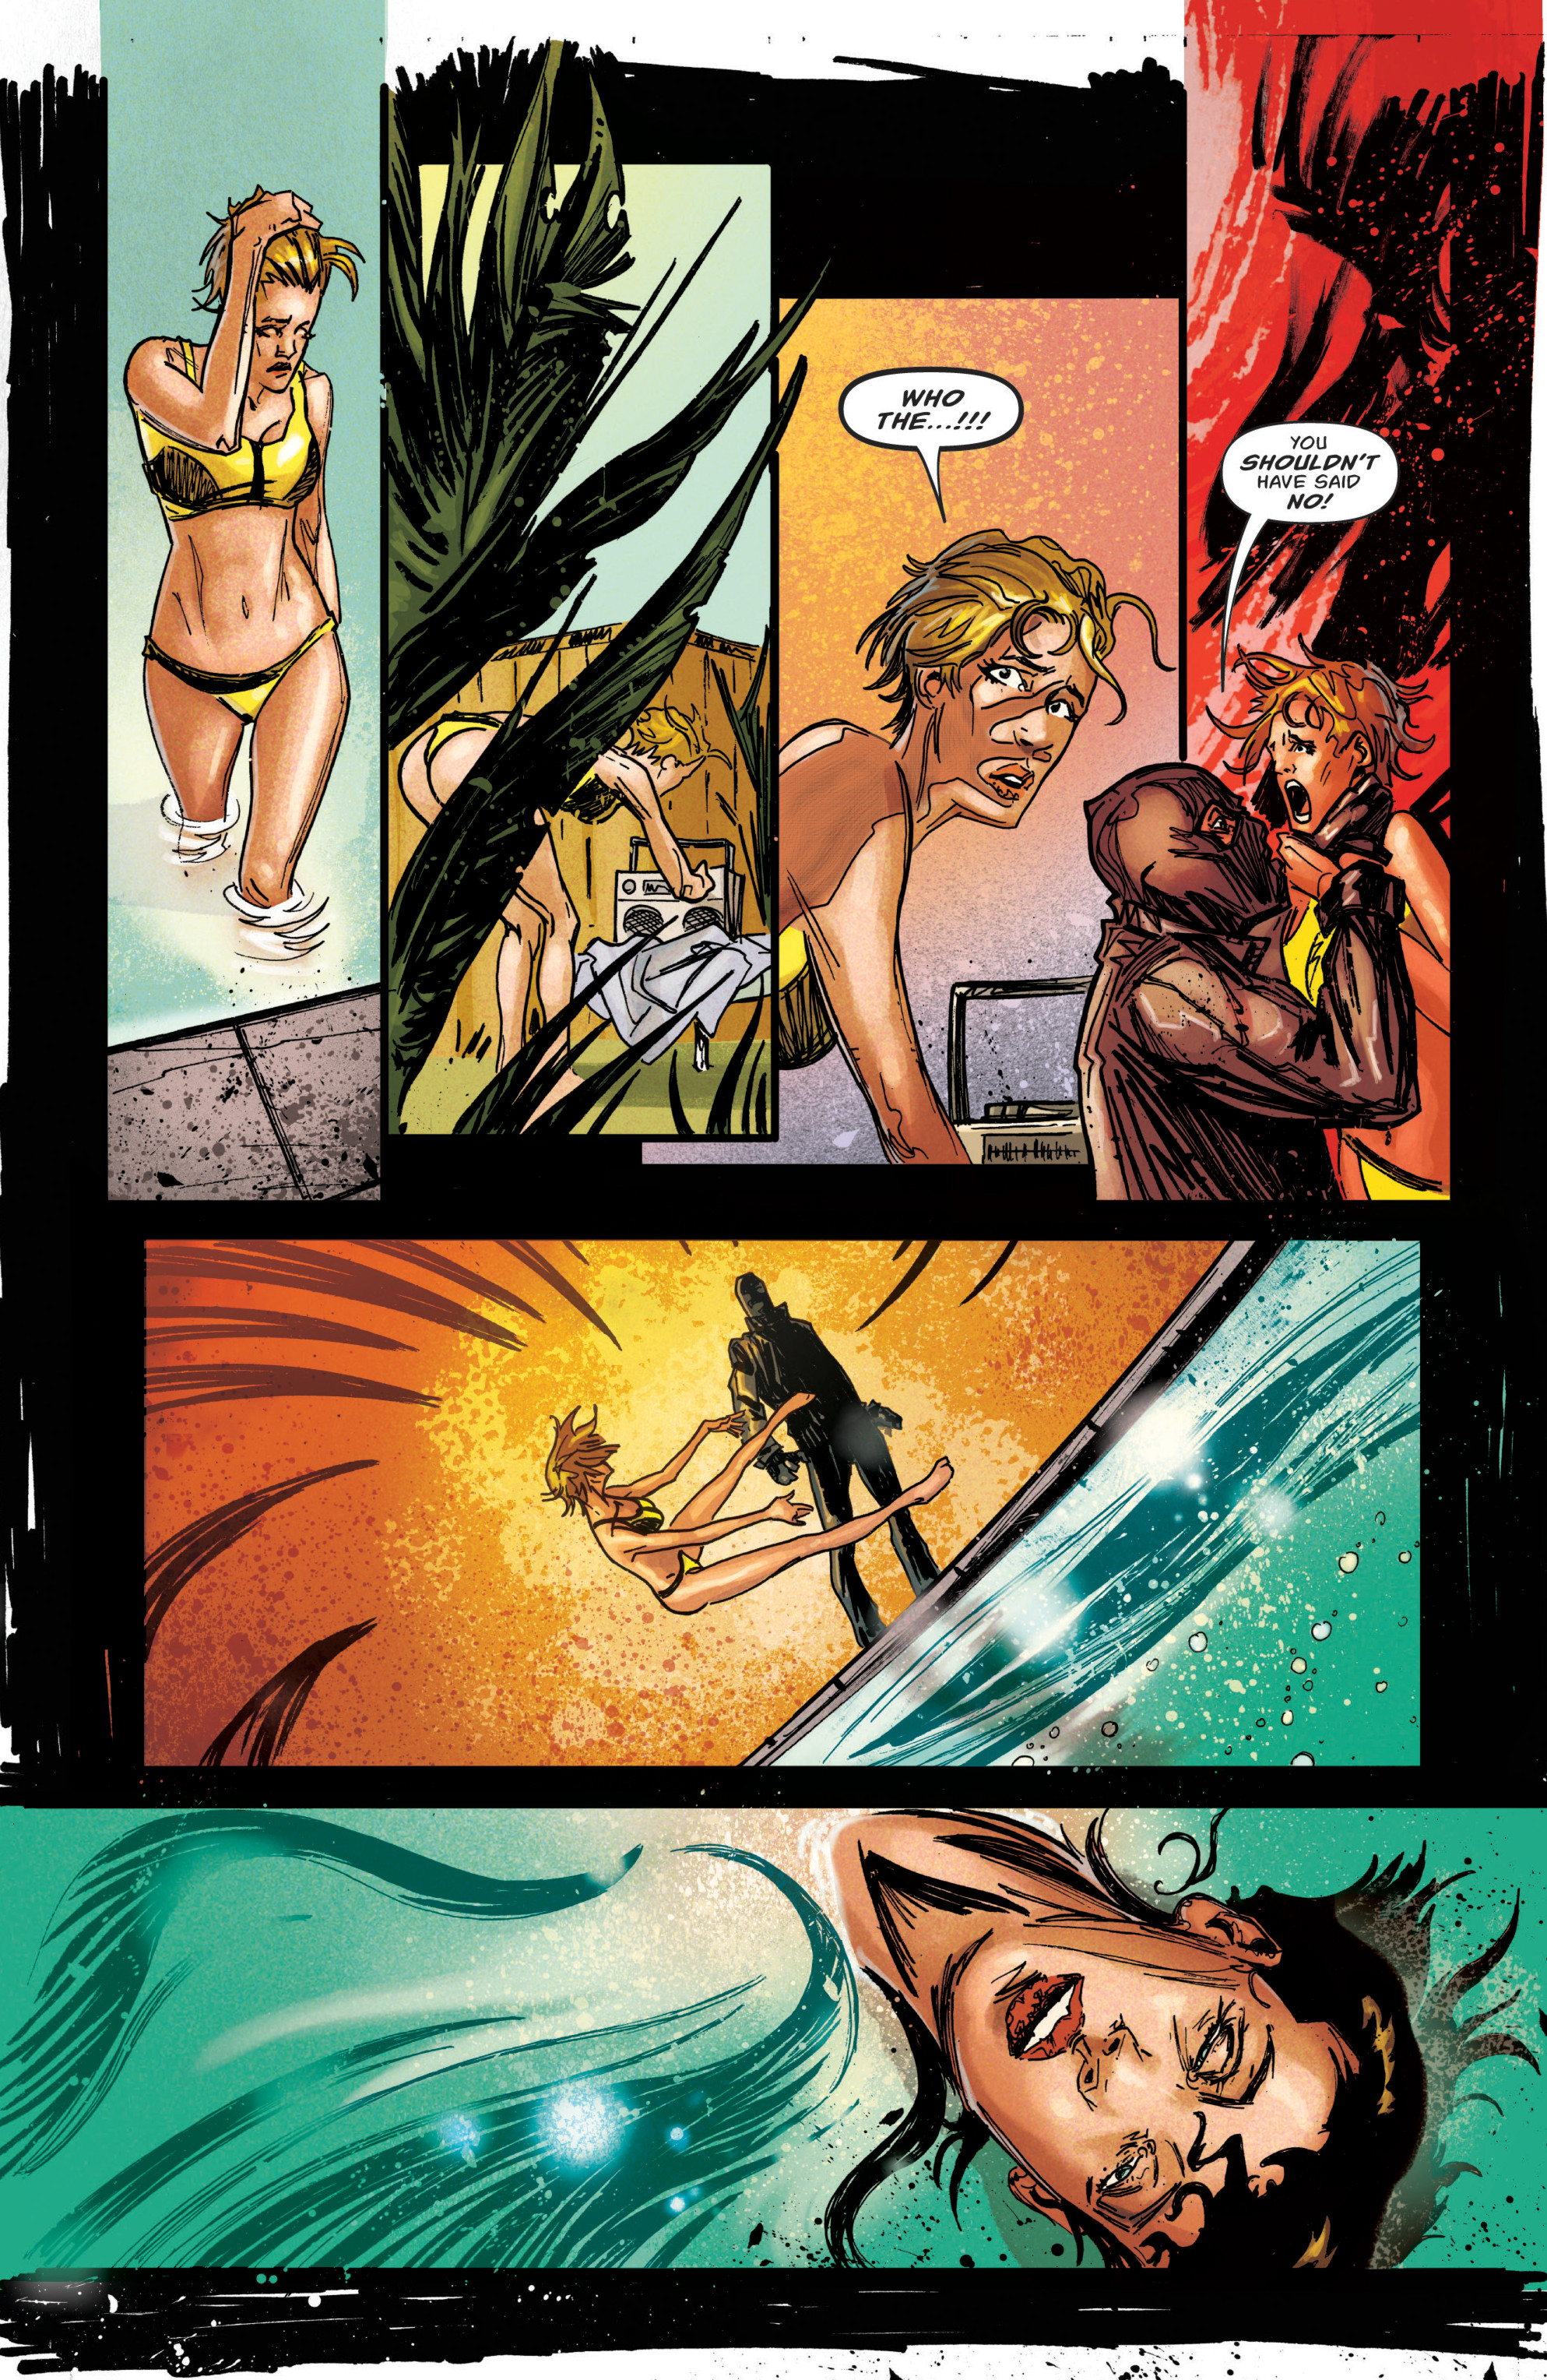 Read online Grimm Tales of Terror: Vol. 3 comic -  Issue #5 - 5